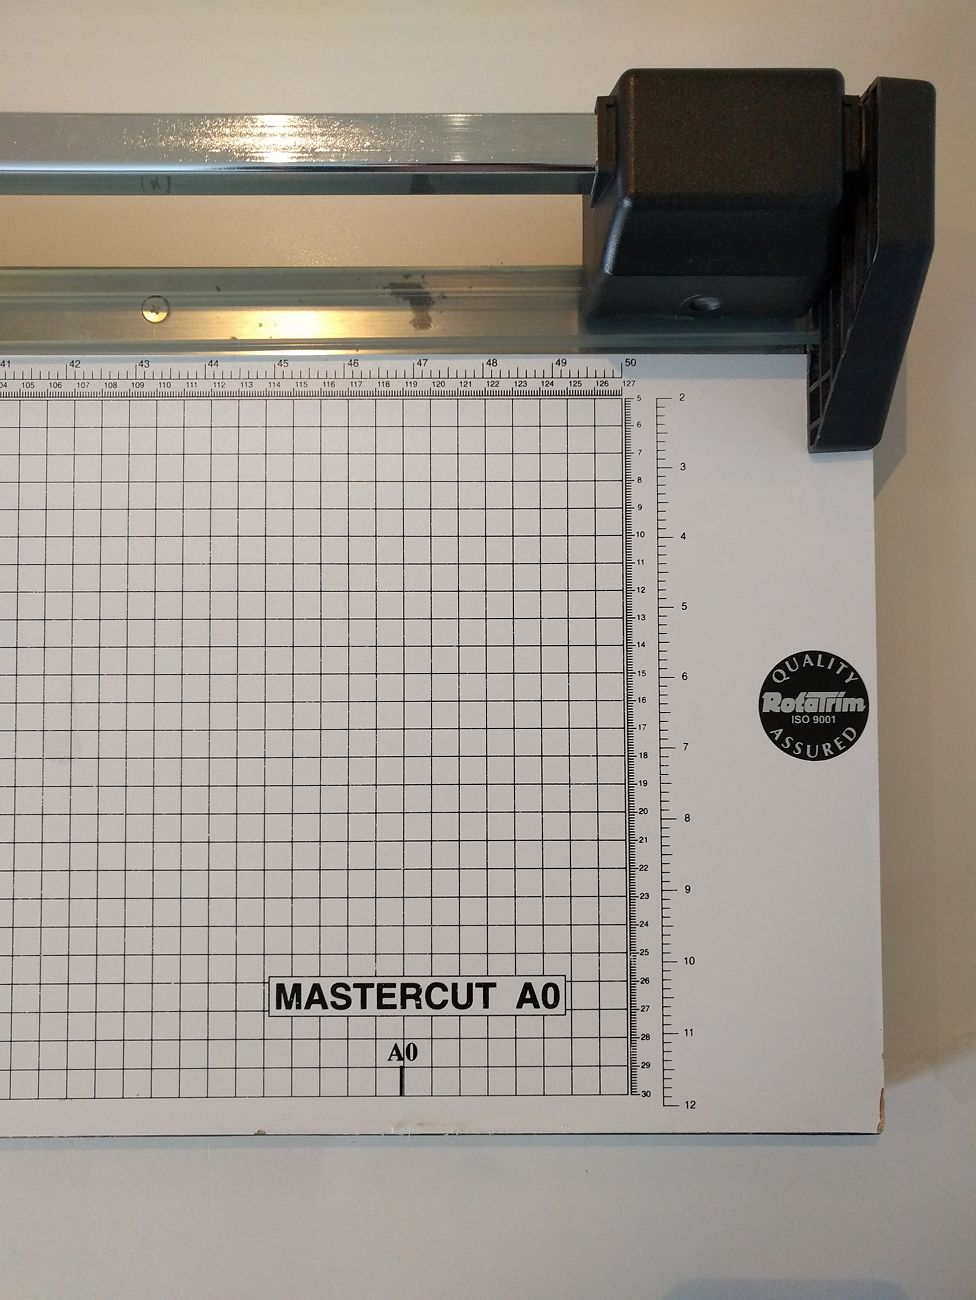 Rotatrim Mastercut A0 Trimmer - Used Image